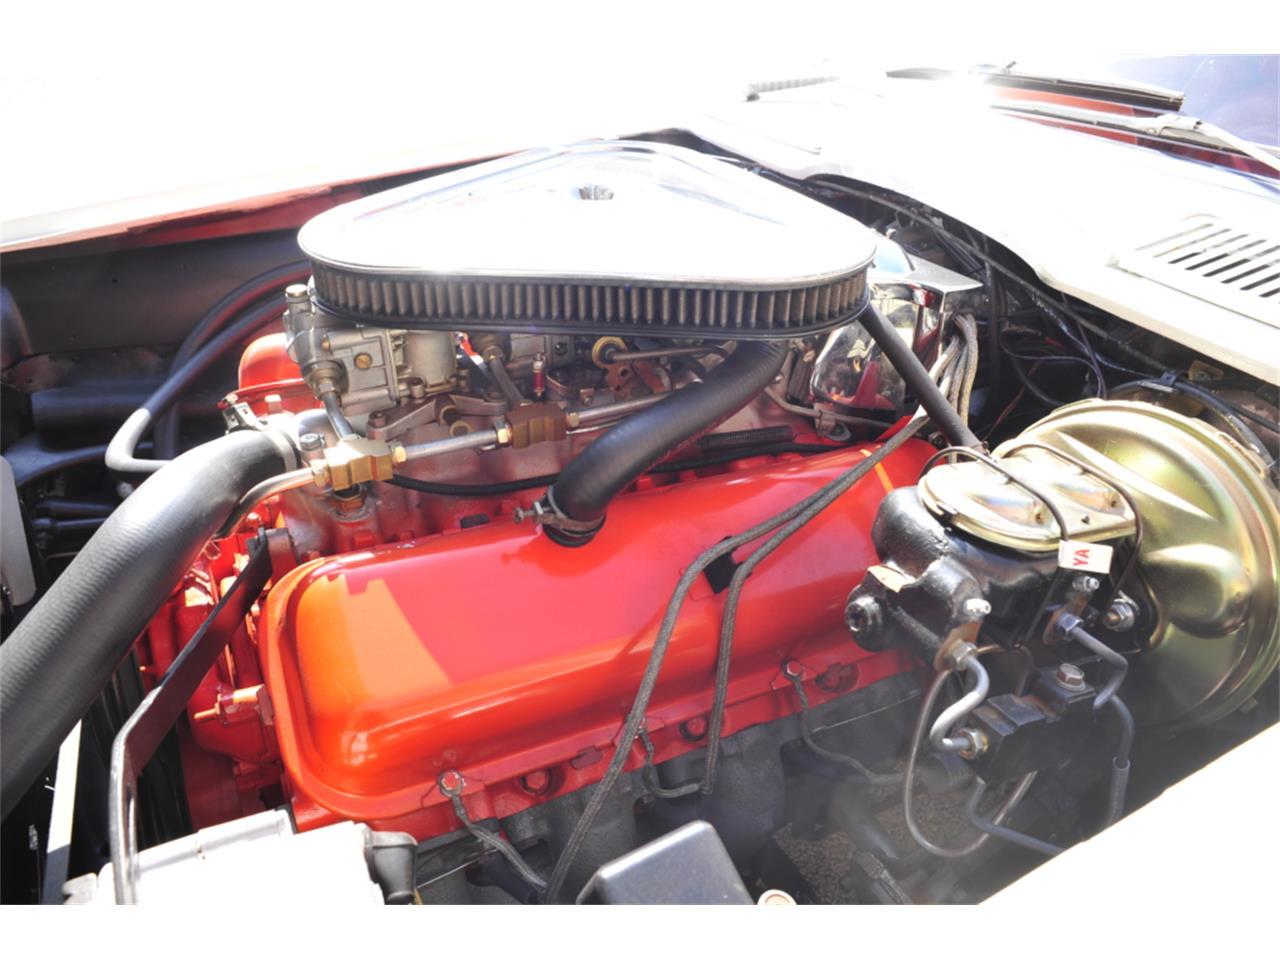 Large Picture of Classic '67 Chevrolet Corvette located in N. Kansas City Missouri - $129,995.00 - PZ9R